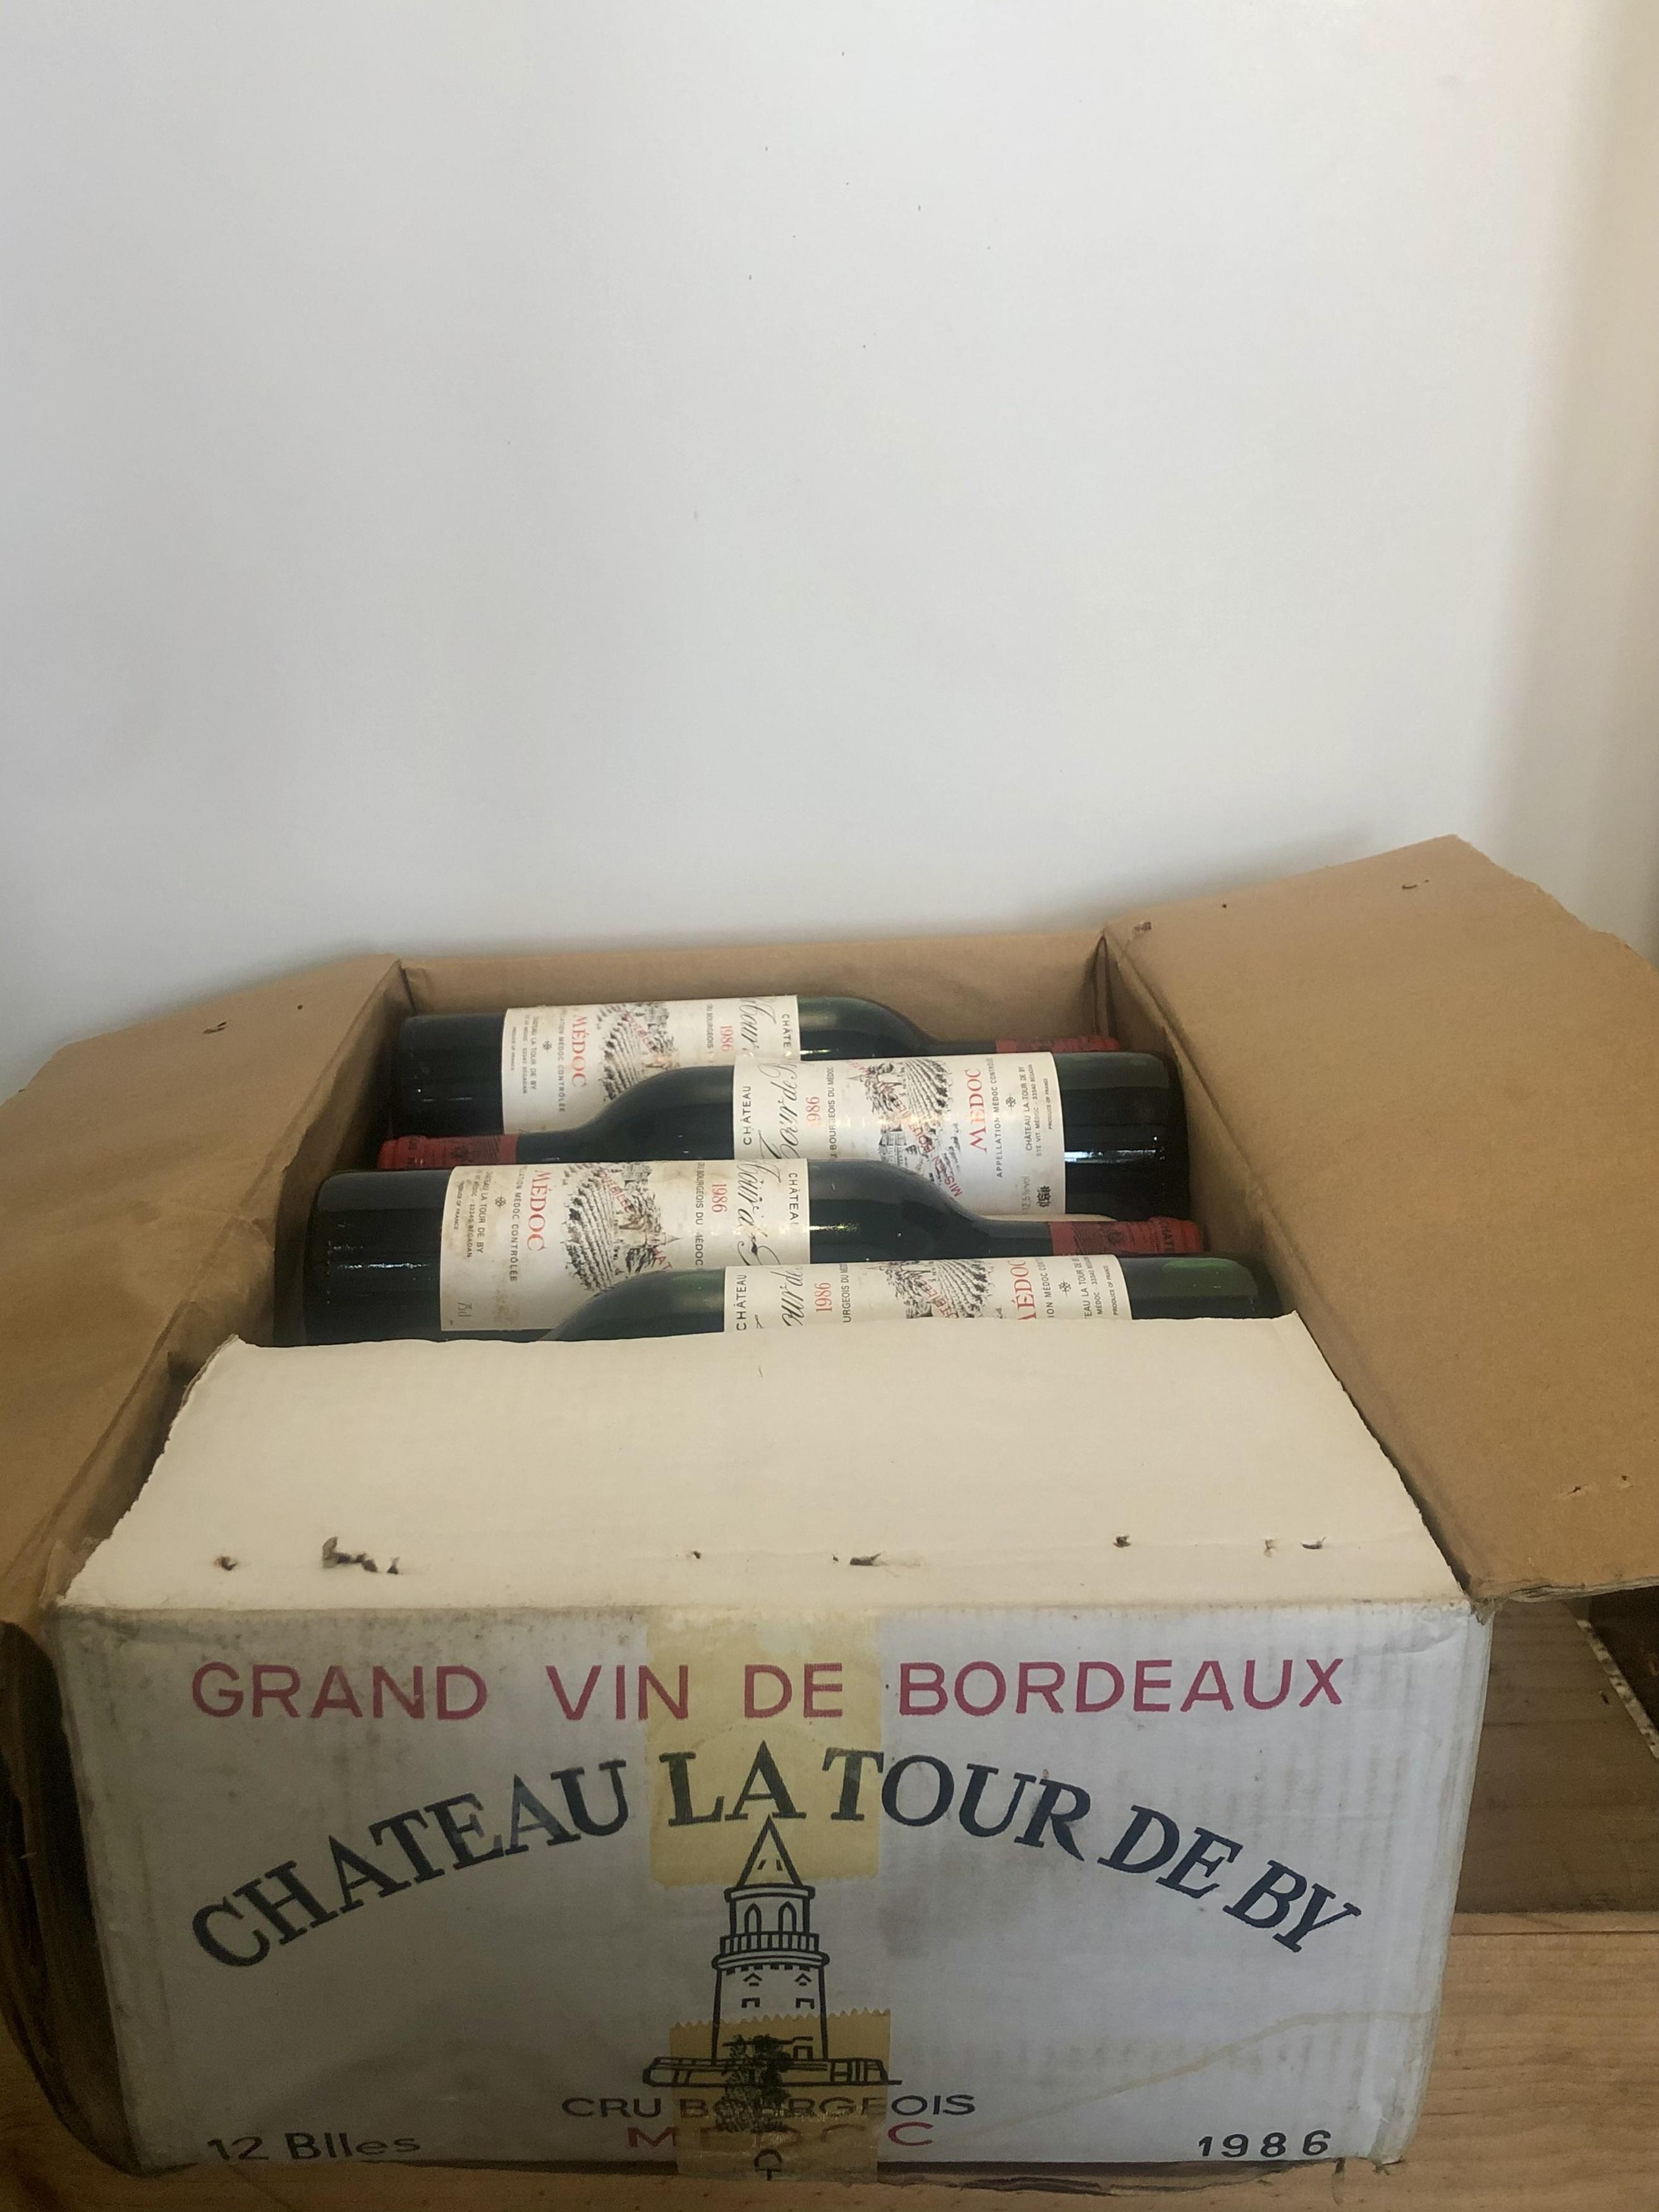 12 bottles (In OCC) Chateau La Tour de By Cru Bourgeois Medoc 1986